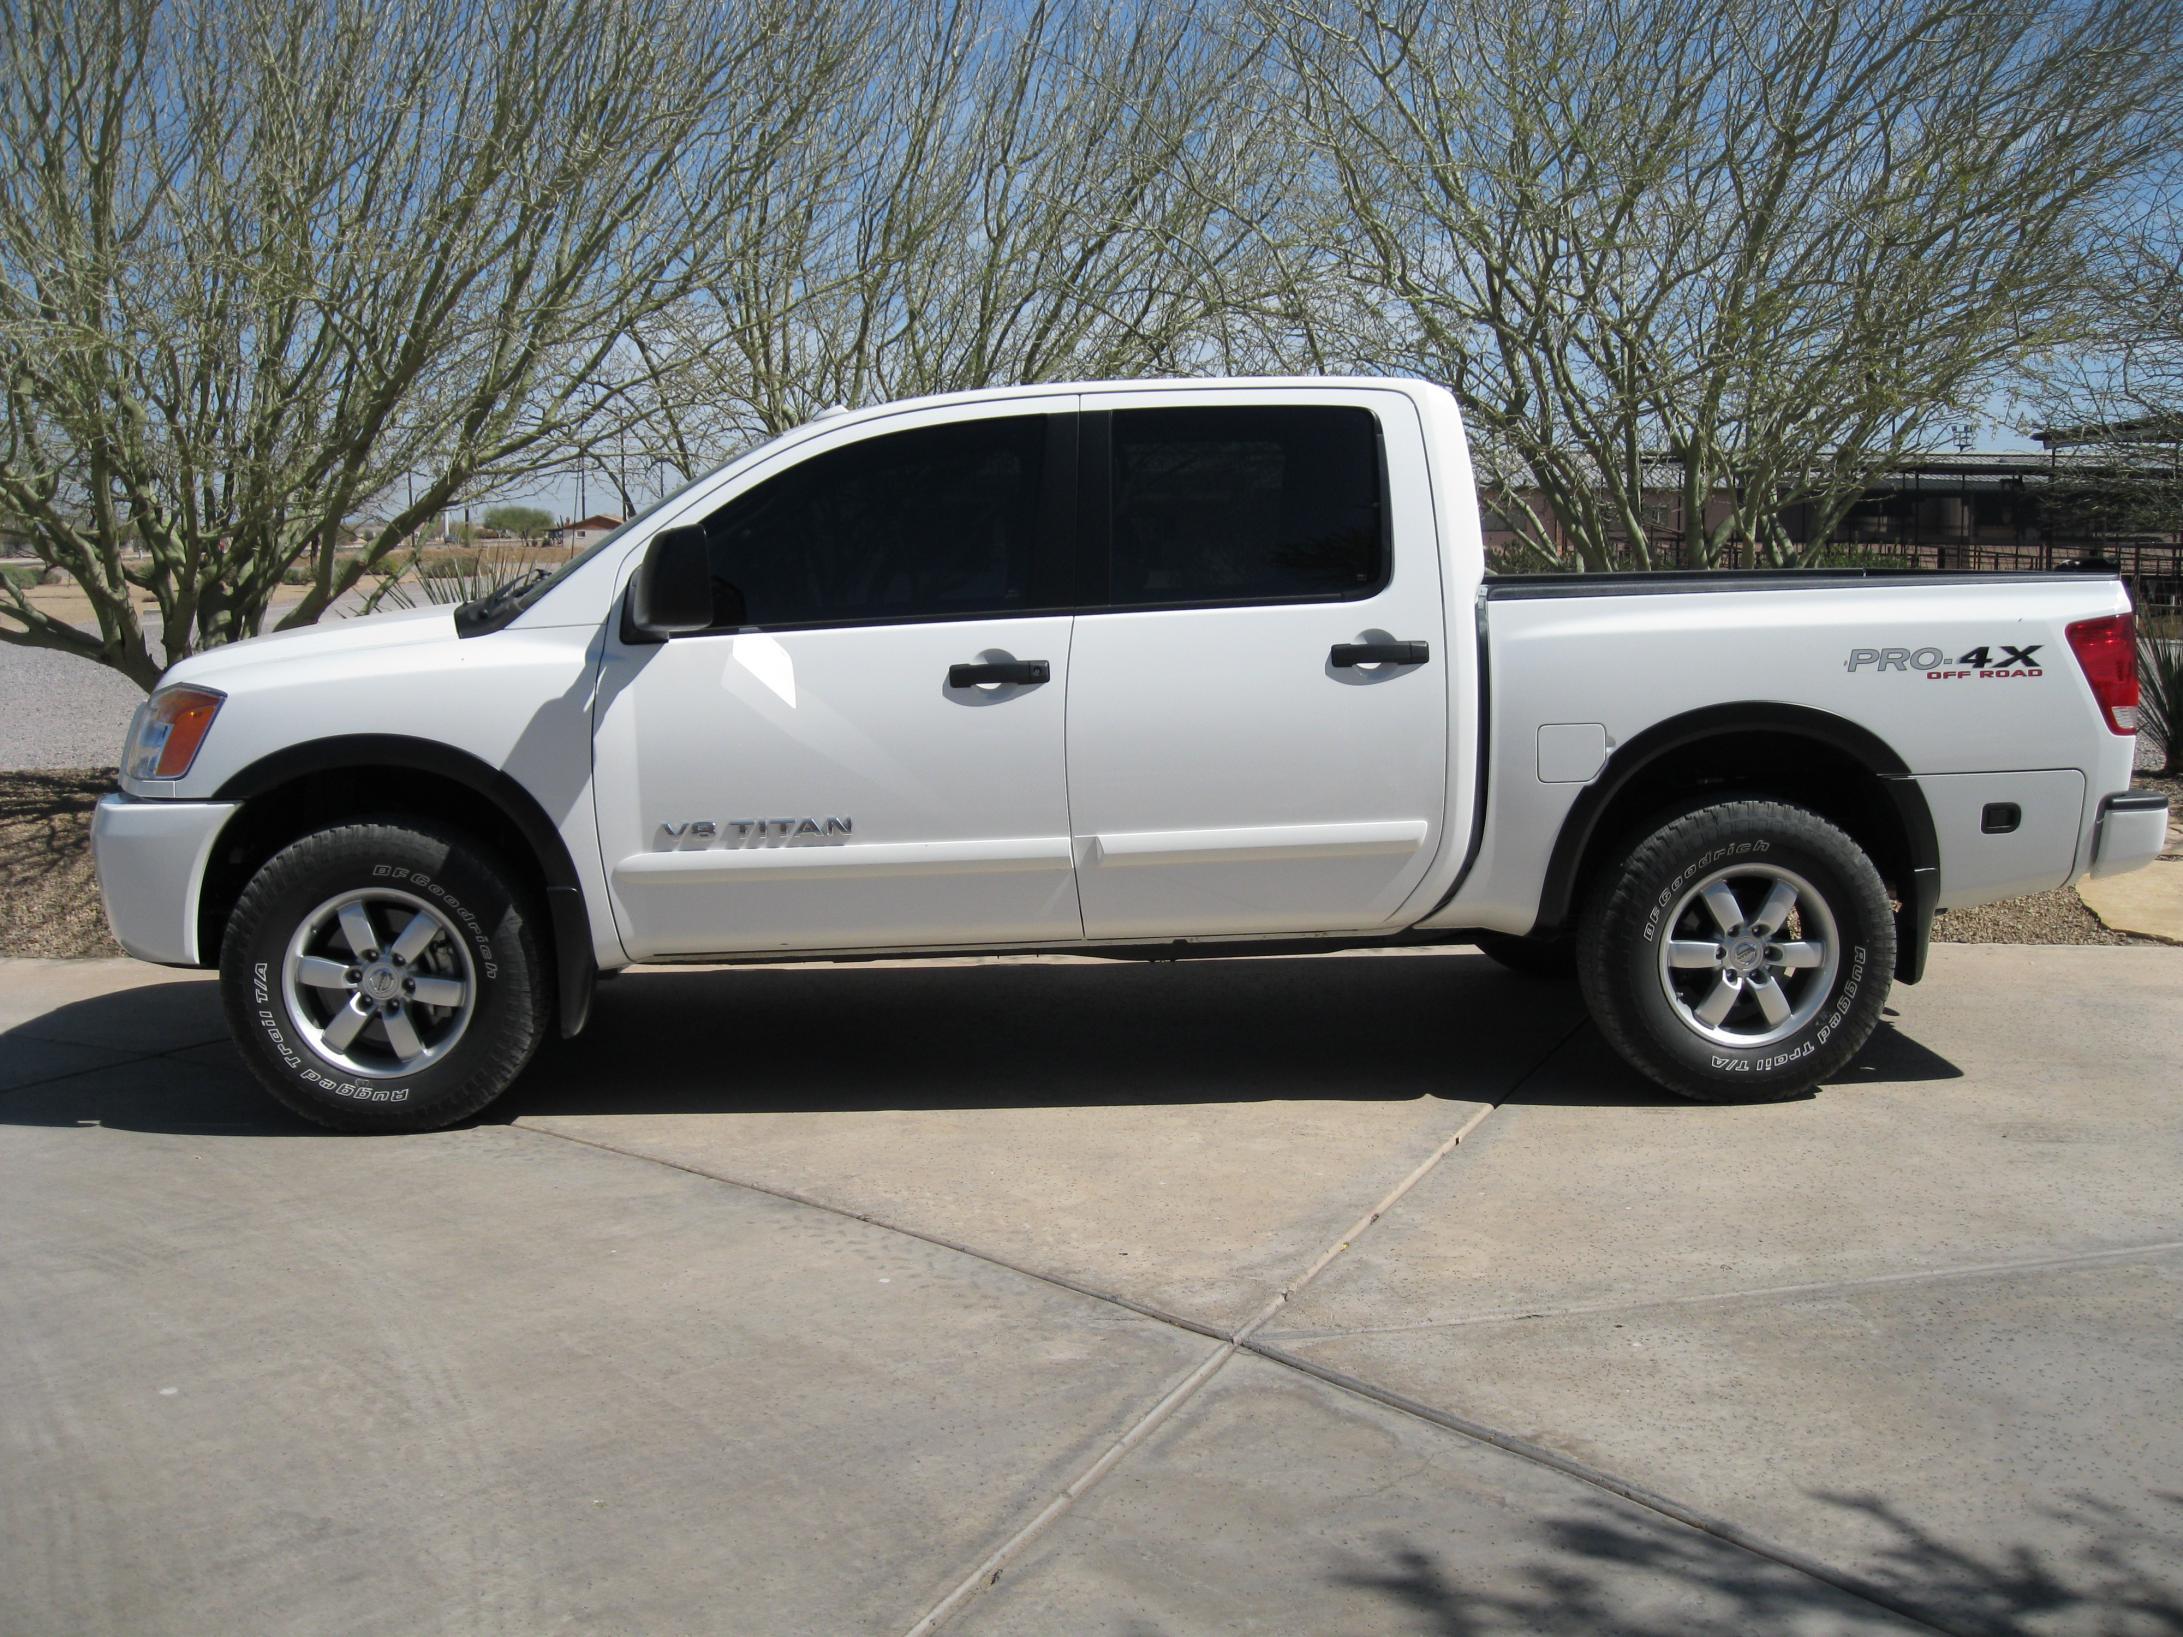 Lift Kit or Leveling Kit? - Nissan Titan Forum